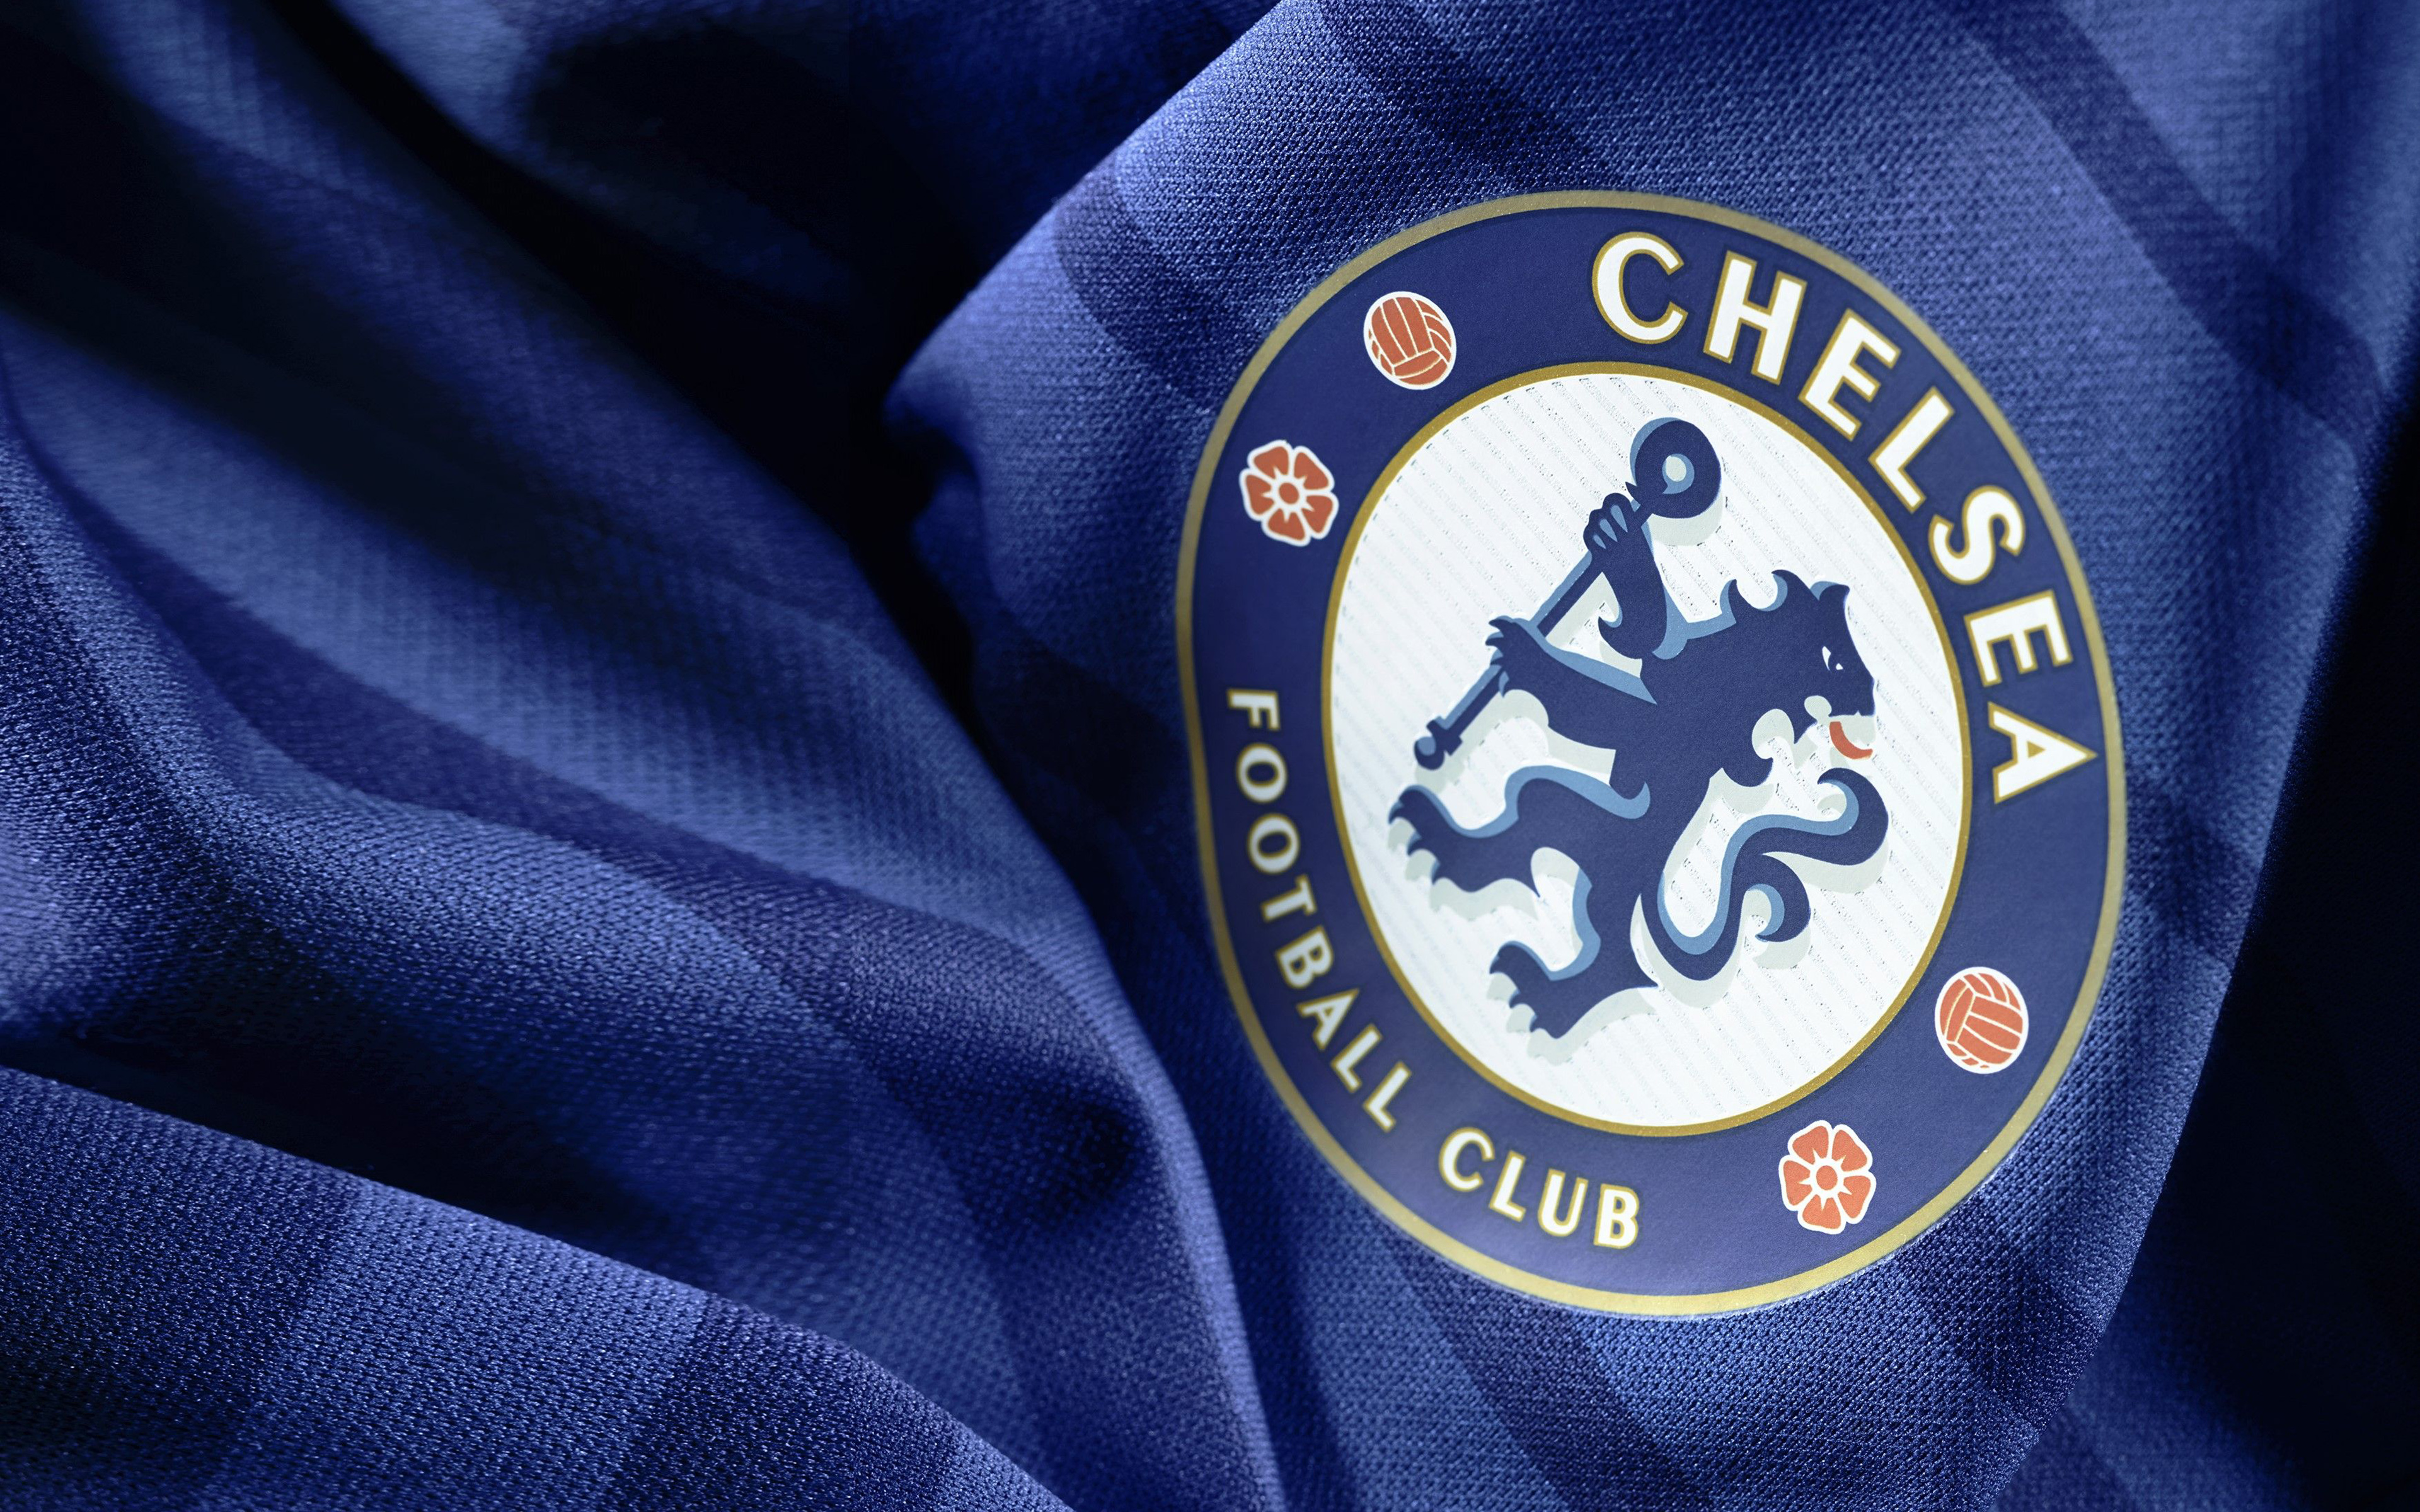 Chelsea Fc 4k Emblem English Football Club Premier Chelsea Logo Wallpaper 4k 3840x2400 Wallpaper Teahub Io